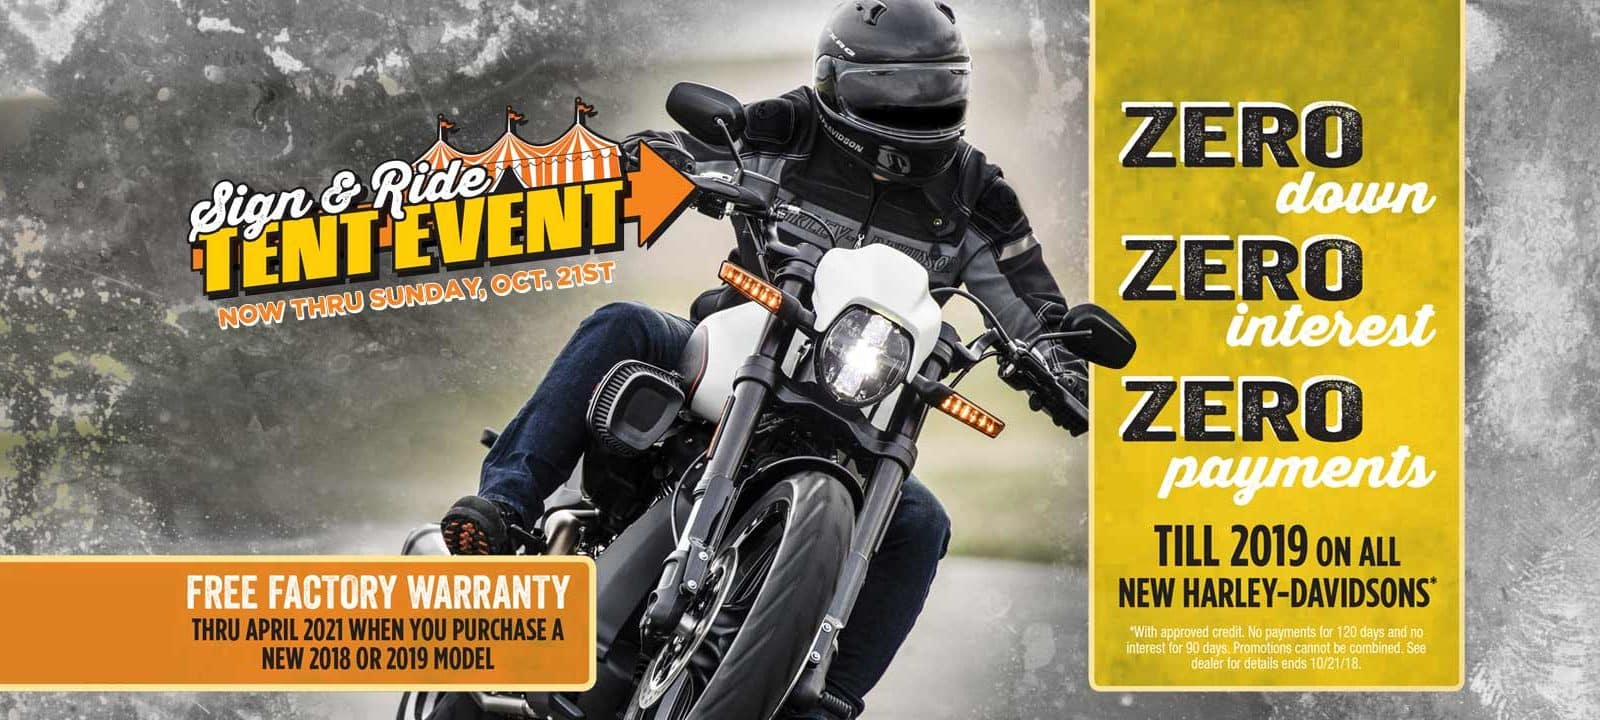 20181015-TMC-1800x720-Sign-&-Ride-Triple-Zero